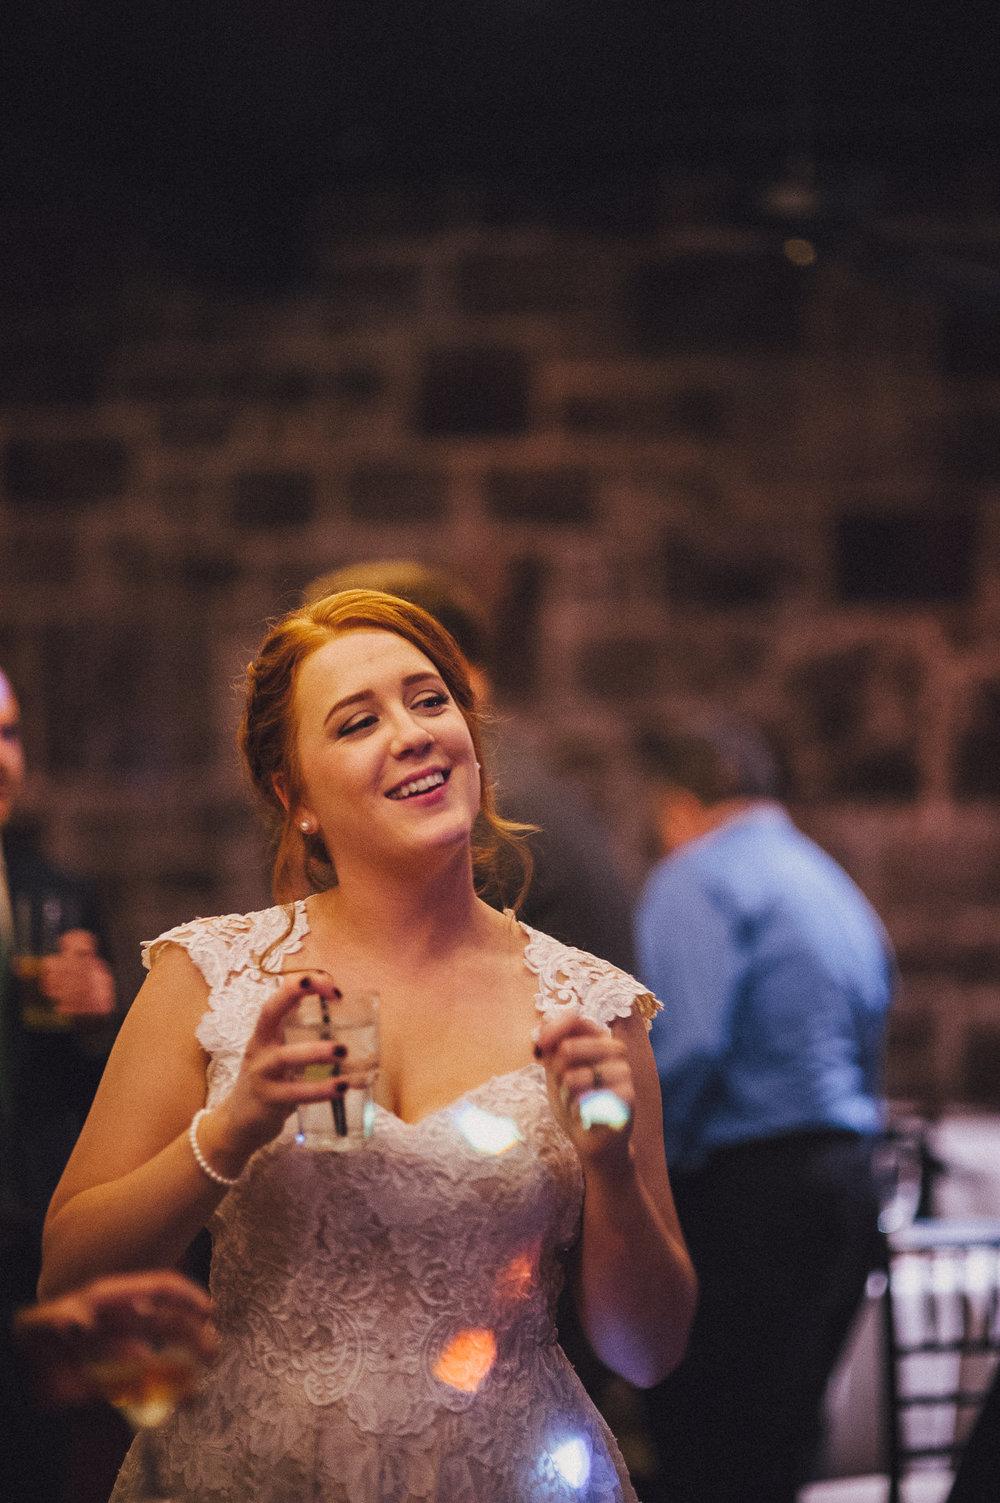 breighton-and-basette-photography-copyrighted-image-blog-amanda-and-eric-wedding-141.jpg